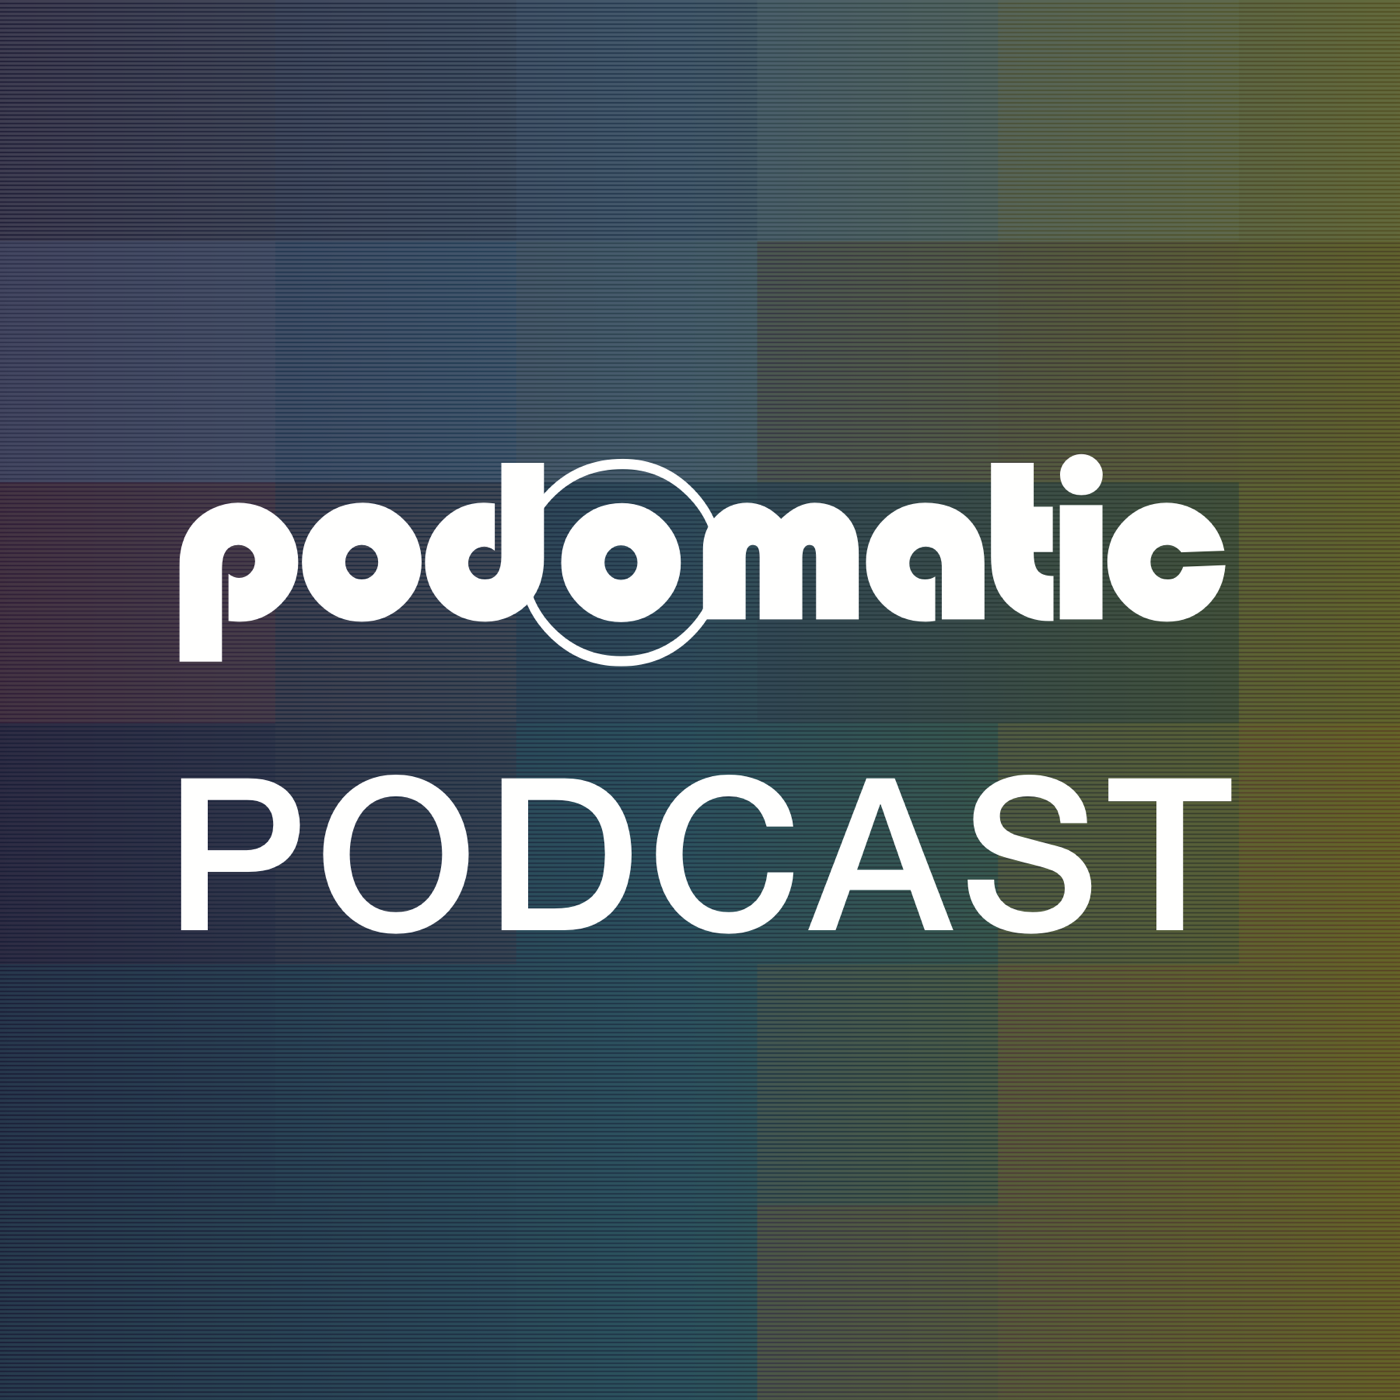 Daniel svensson's Podcast